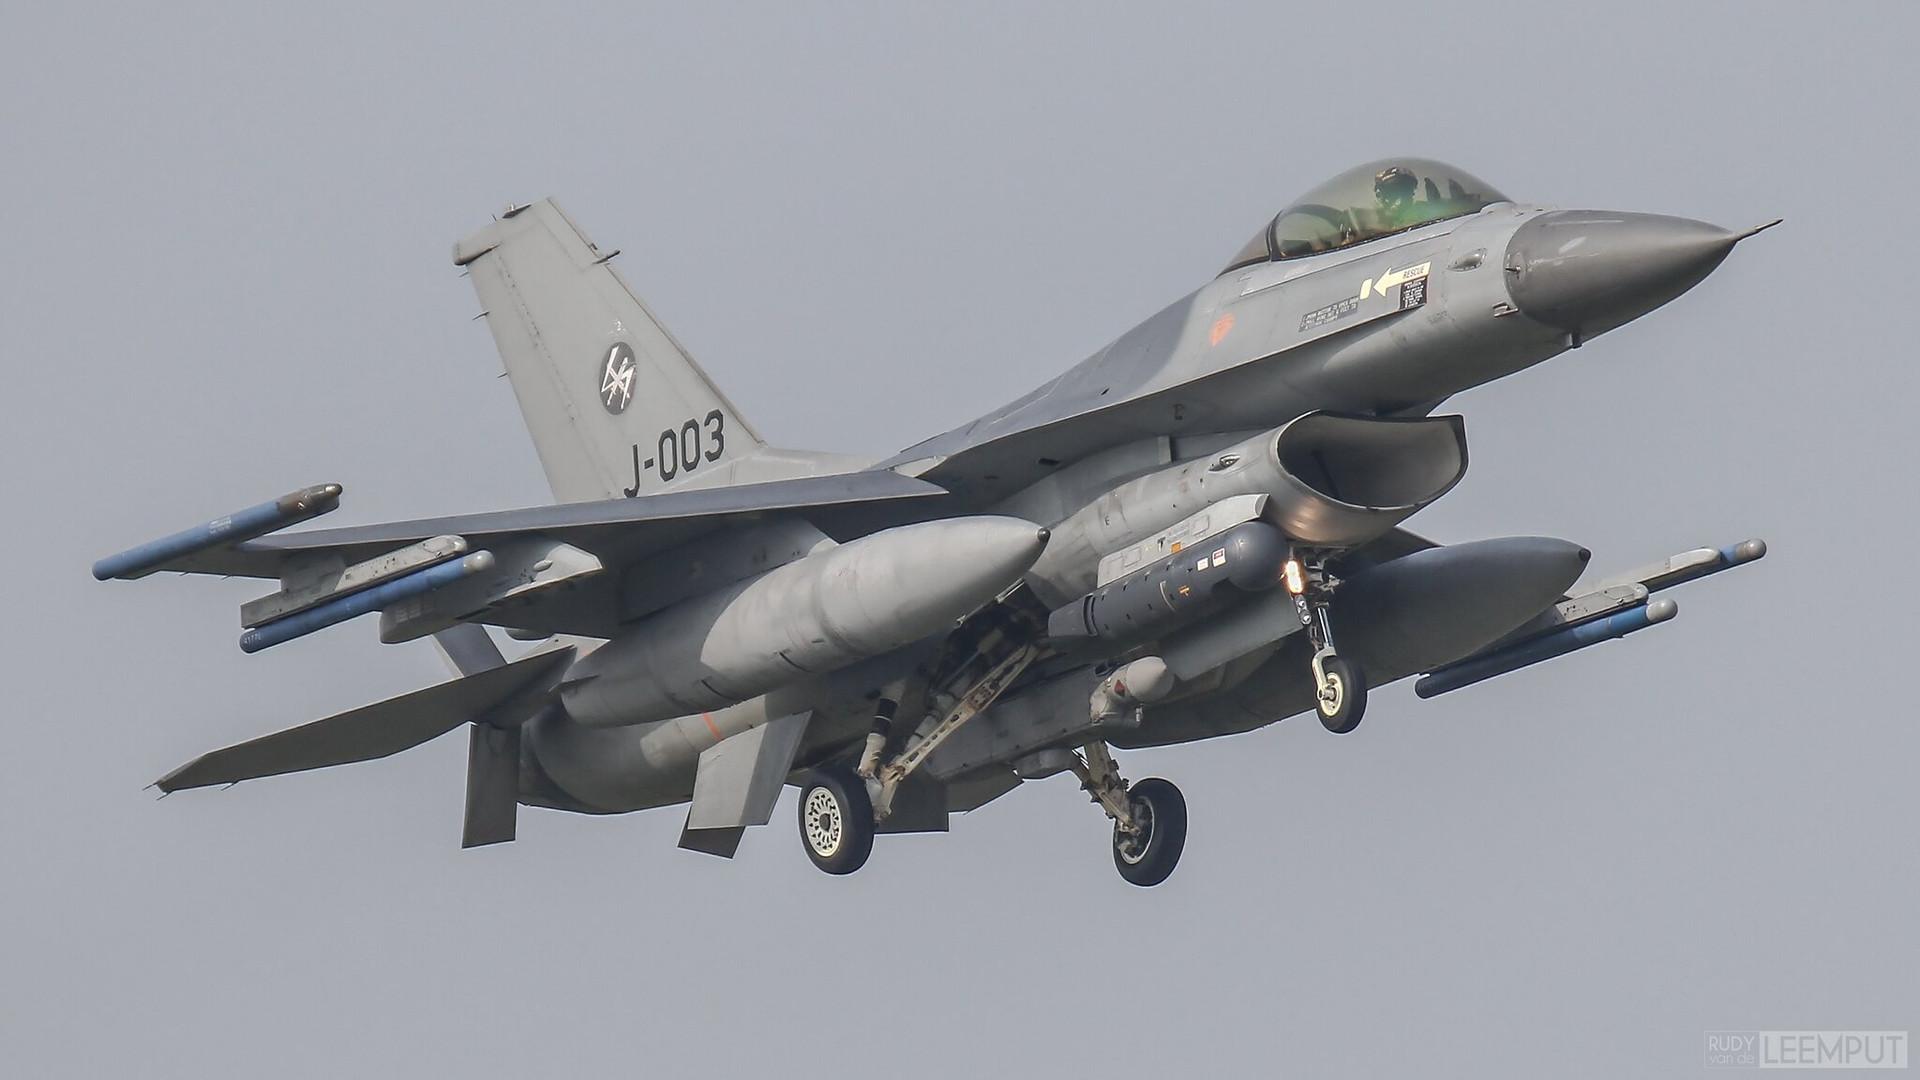 J-003   Build: 1990 - Lockheed F-16 A Fighting Falcon